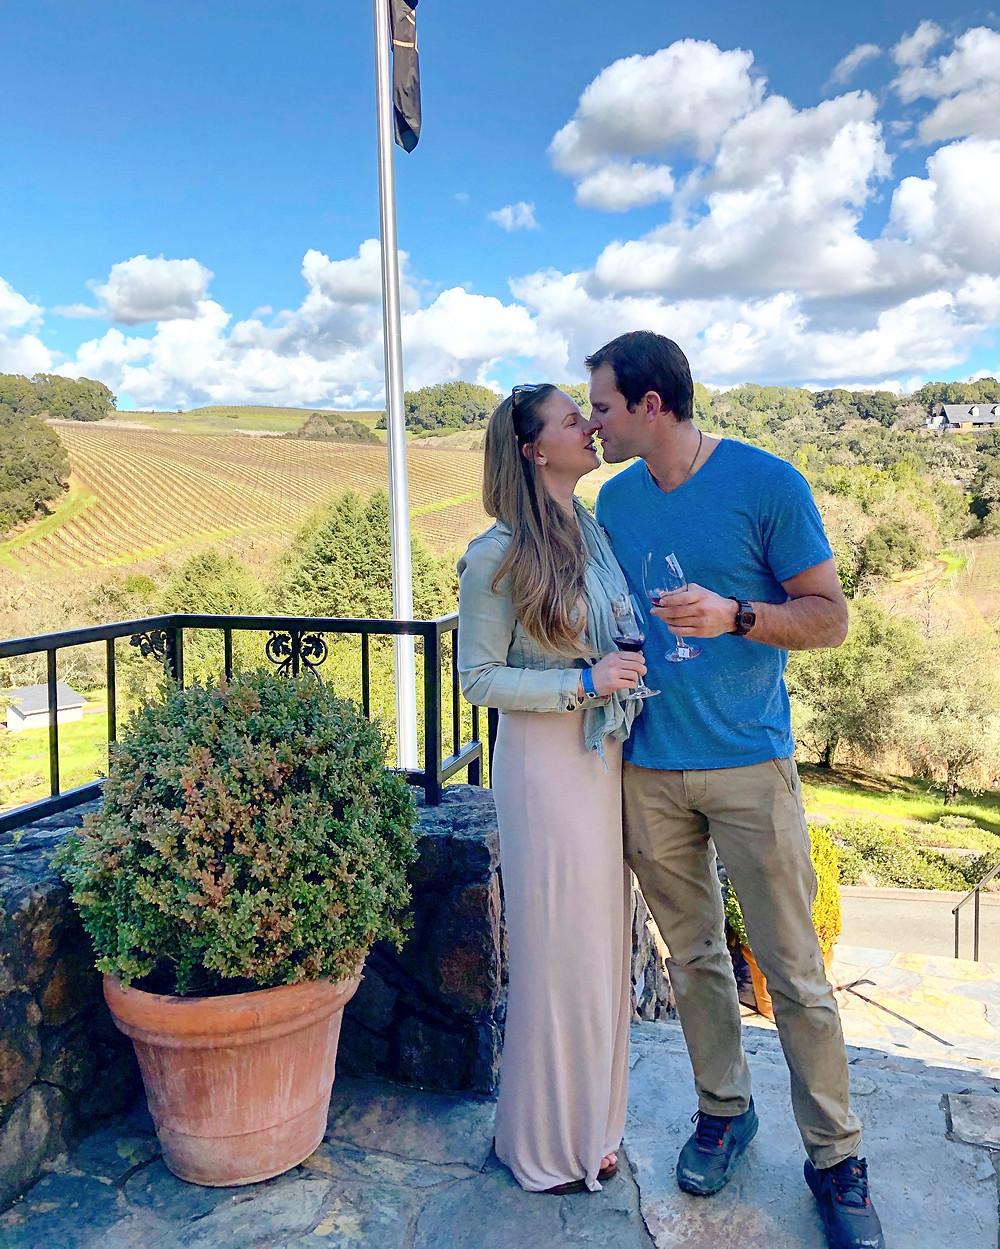 a couple enjoying a romantic wine tasting in Sonoma County, California